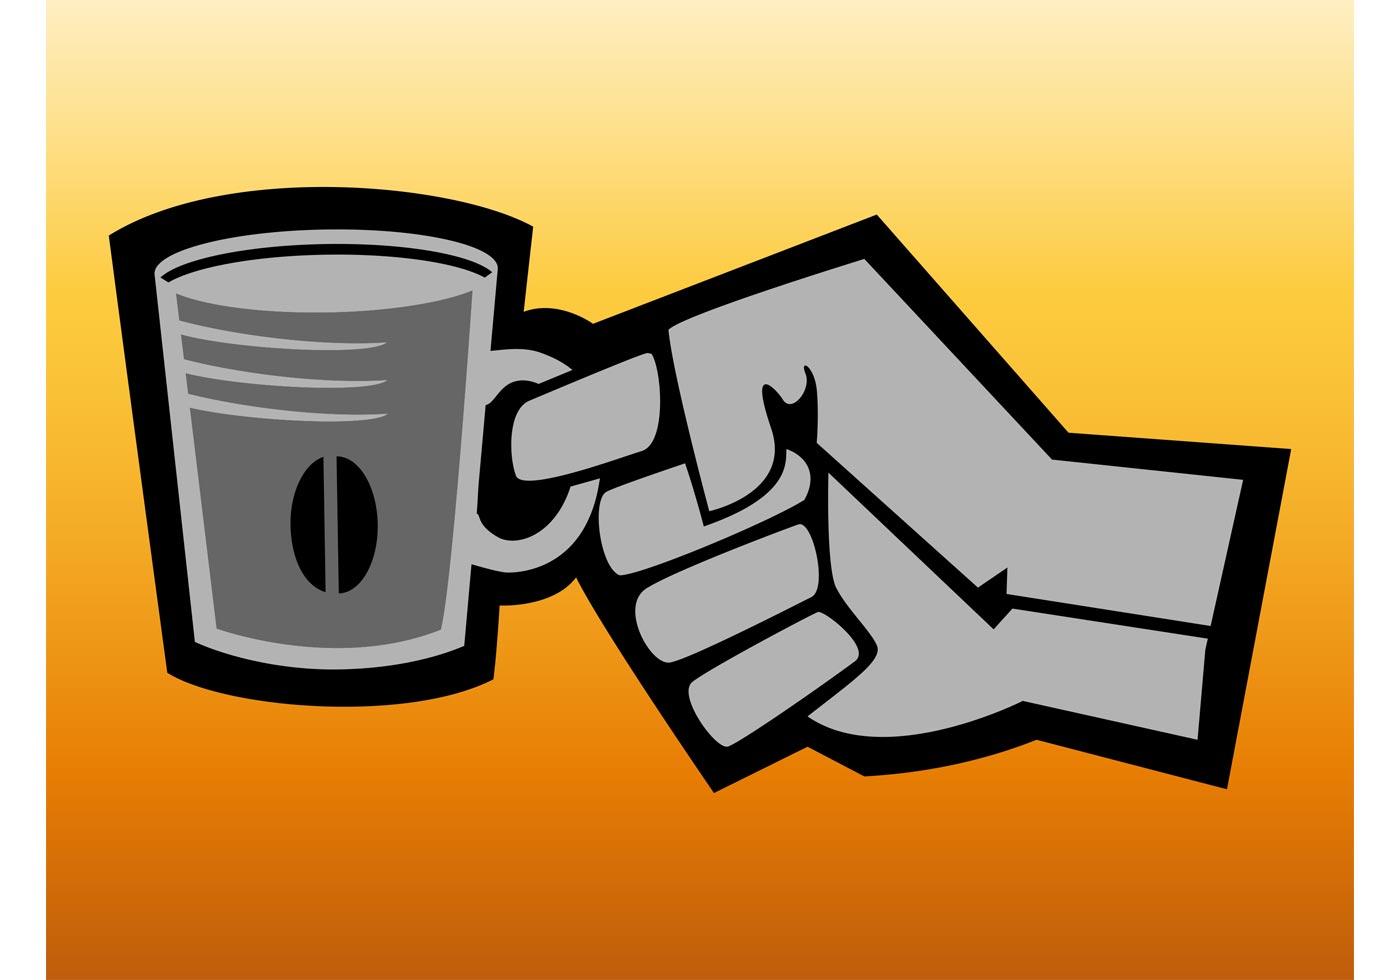 Retro Coffee Logo - Download Free Vectors, Clipart ...